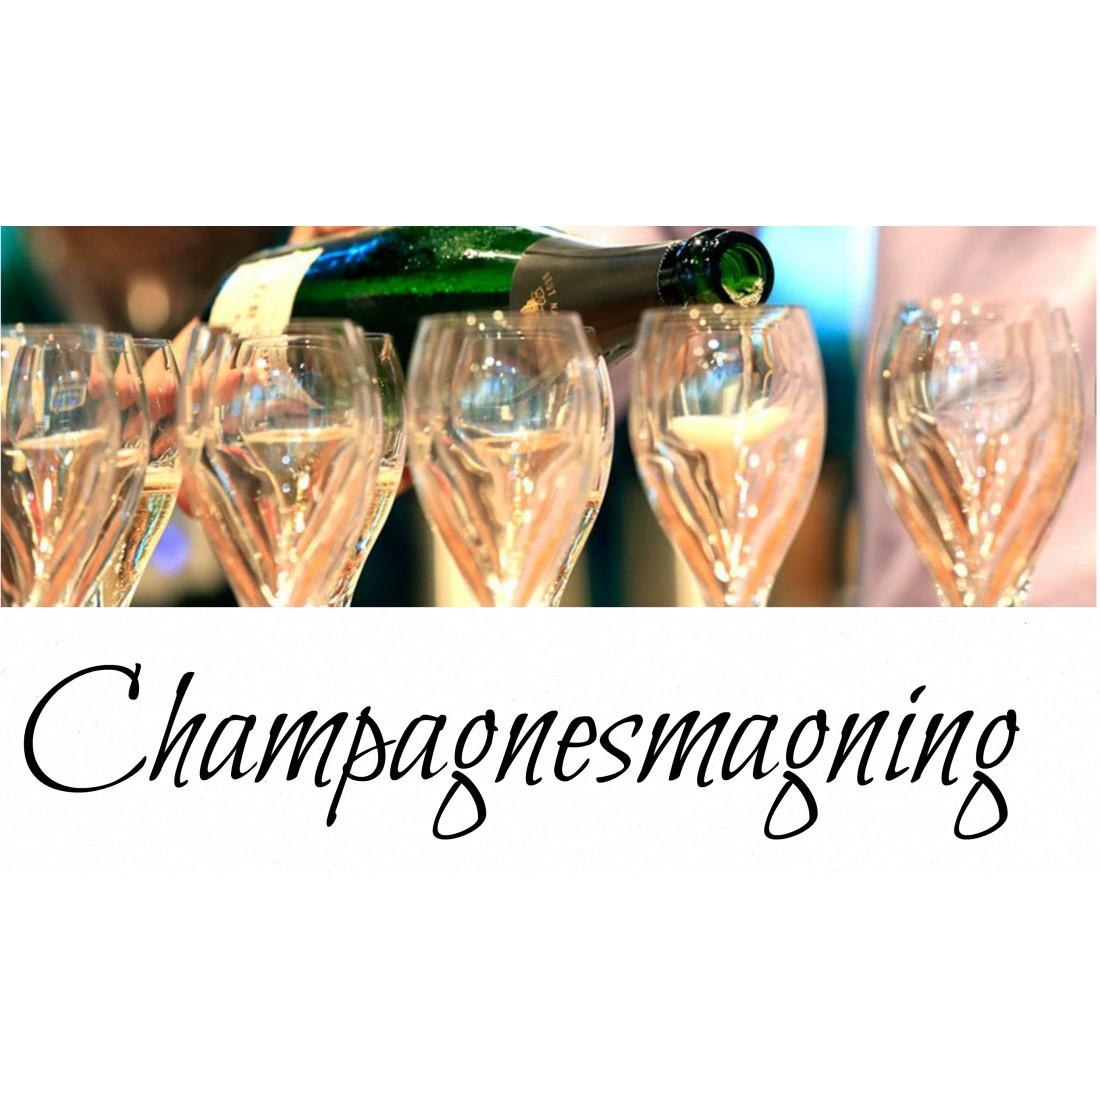 Champagnesmagninglrdagden27novemberkl1900IChampagneKlderen-31